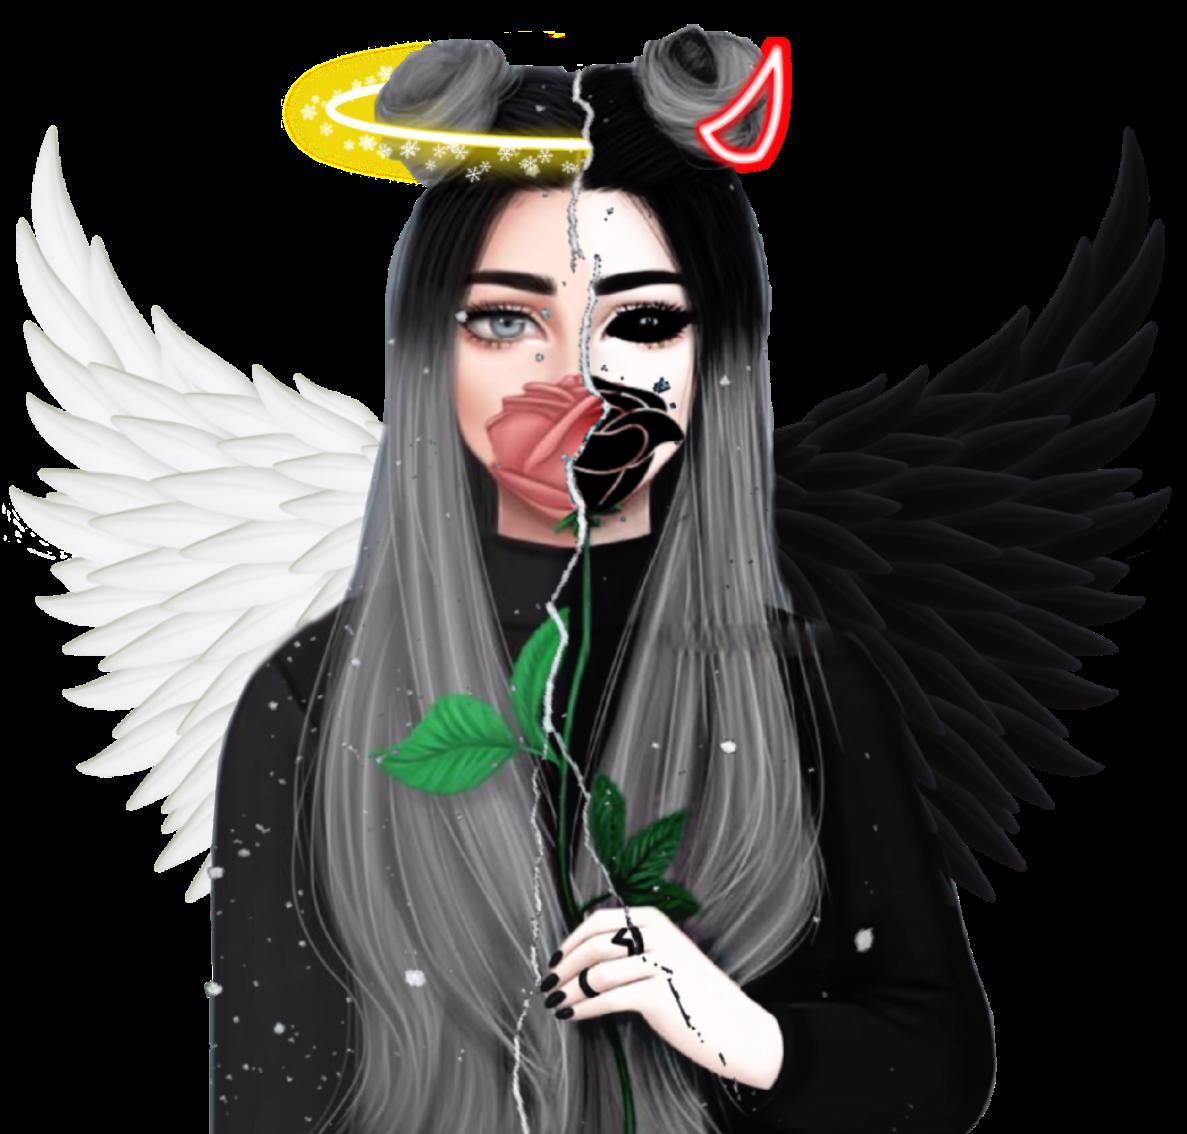 anime art angel Sticker by makaoglu em 2020 Fotos